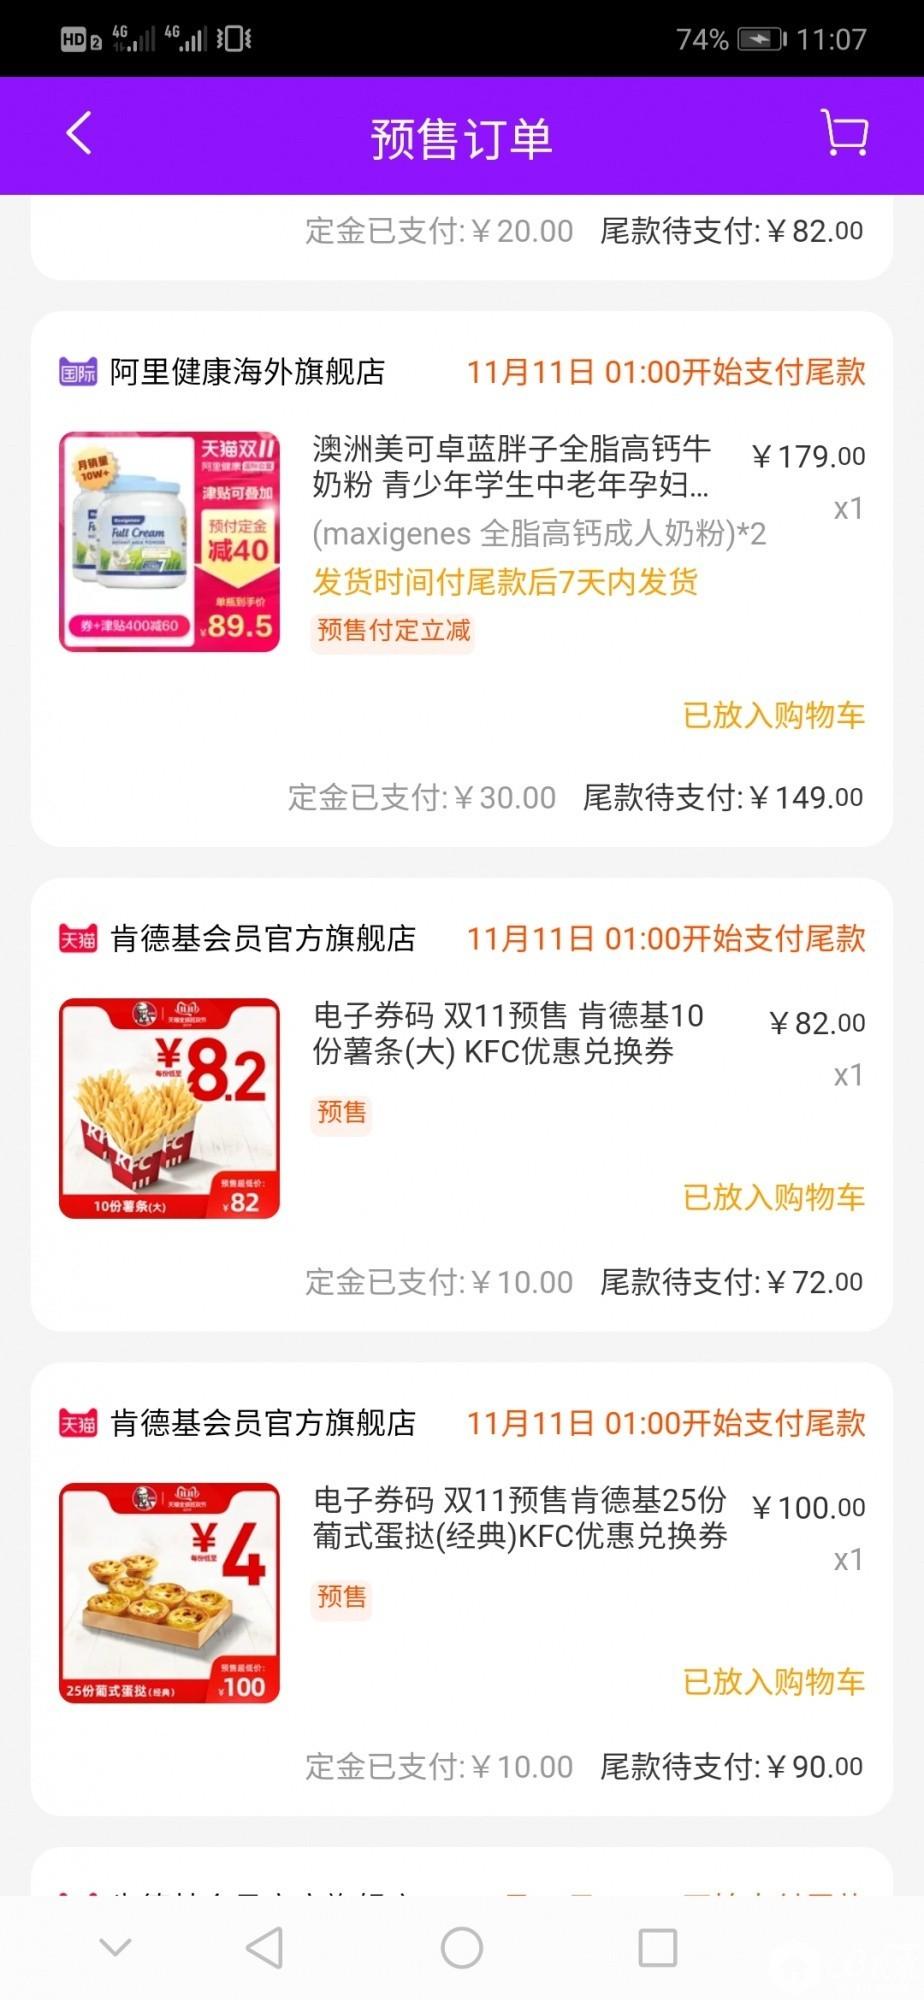 Screenshot_20191031_230750_com.taobao.taobao.jpg